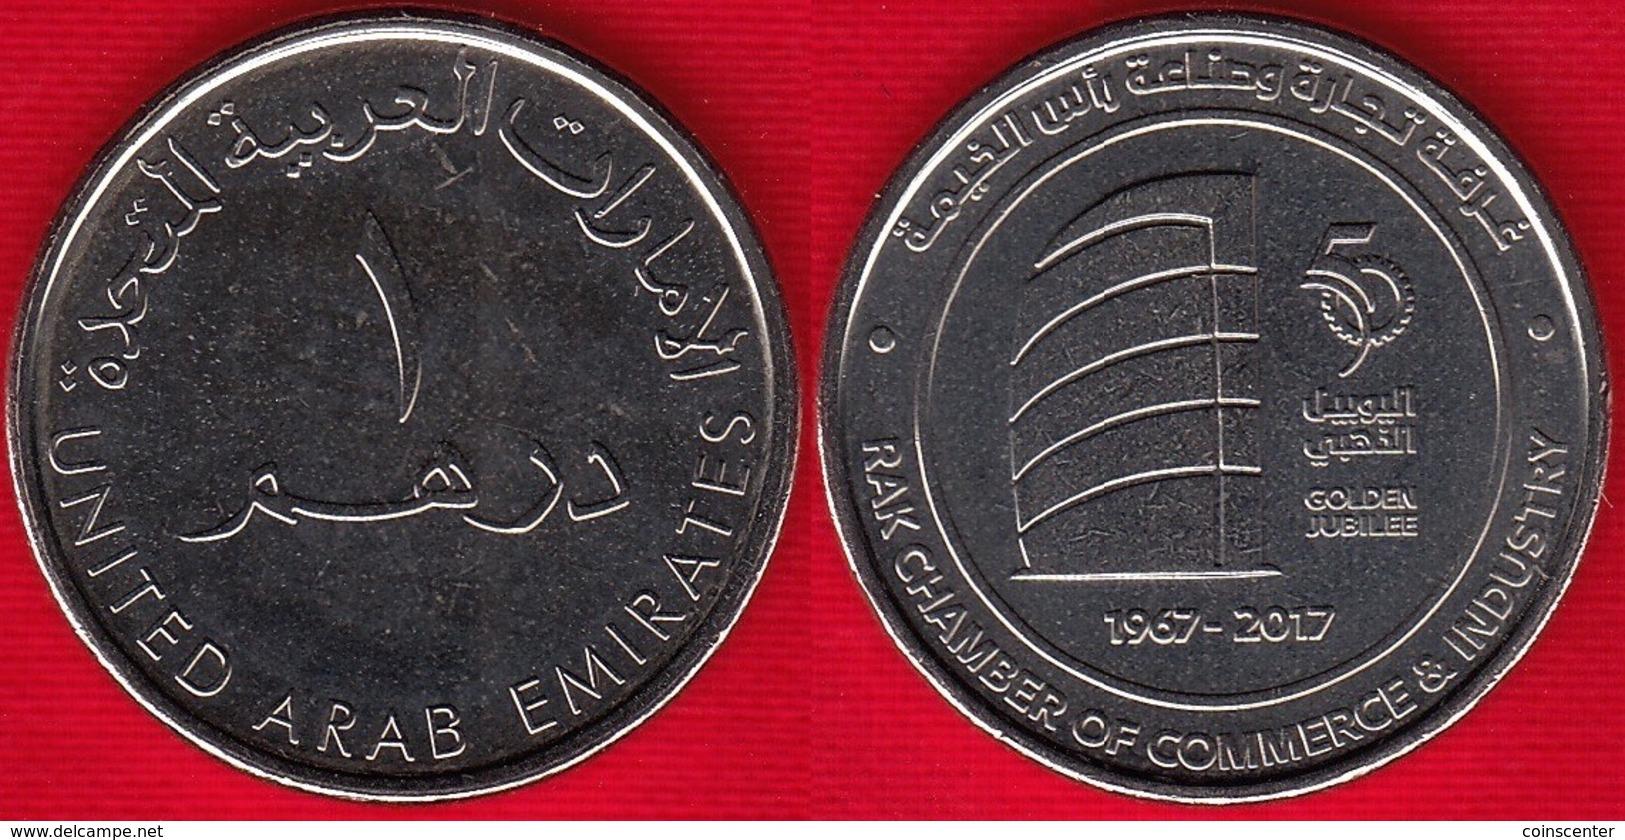 "United Arab Emirates 1 Dirham 2017 ""Ras Al Khaimah Chamber"" UNC - Emirats Arabes Unis"